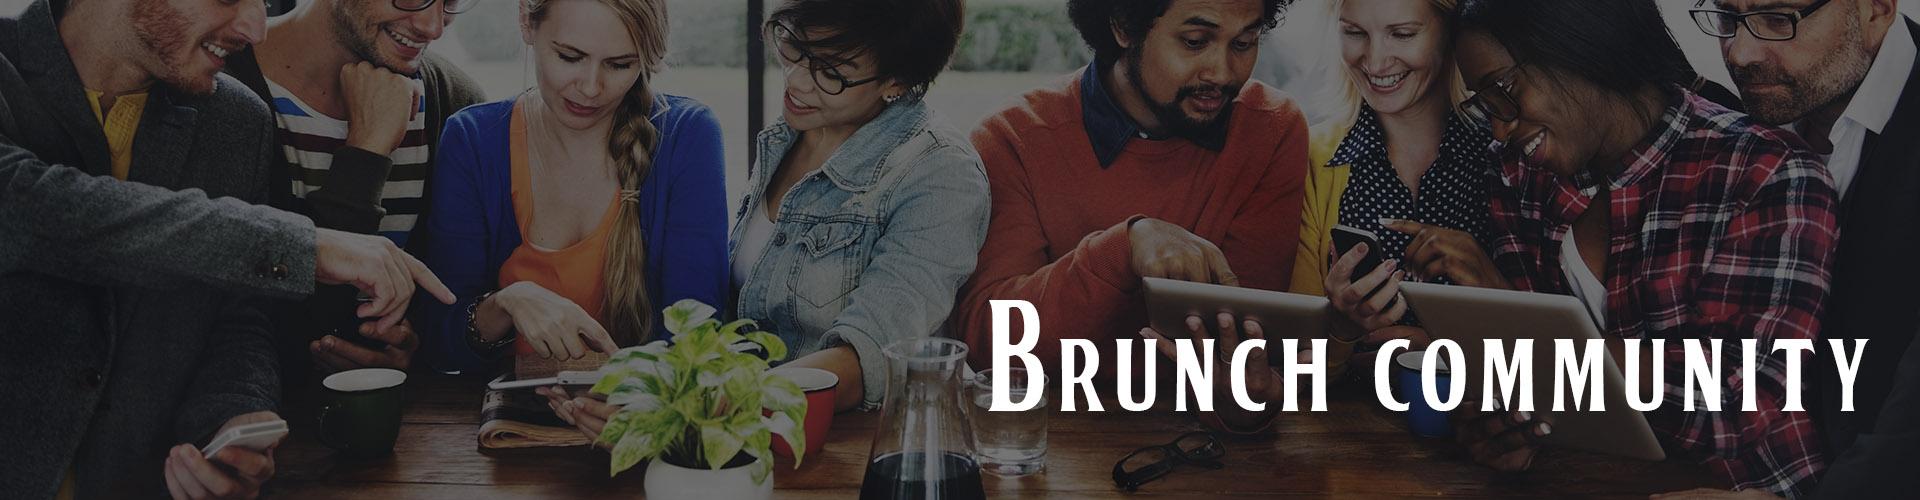 Brunch Community